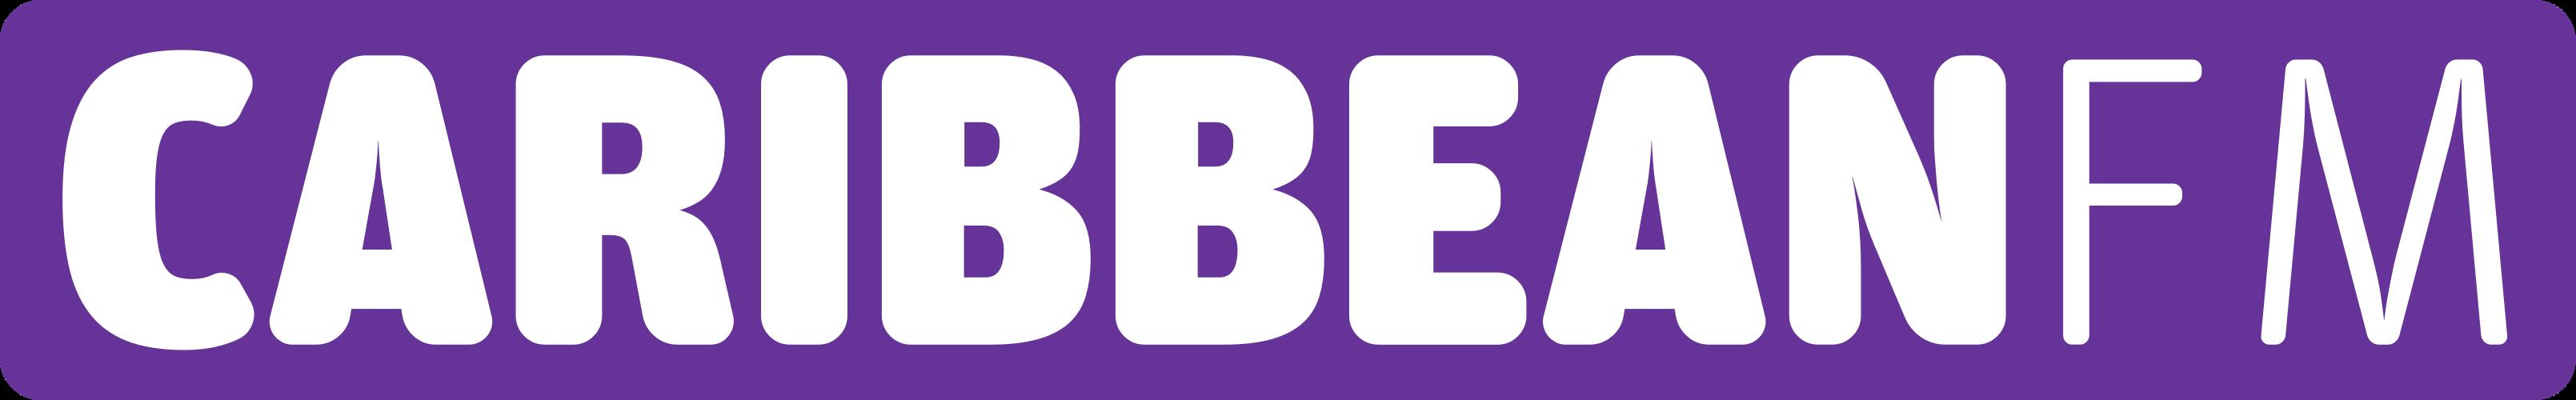 caribbeanfm logo